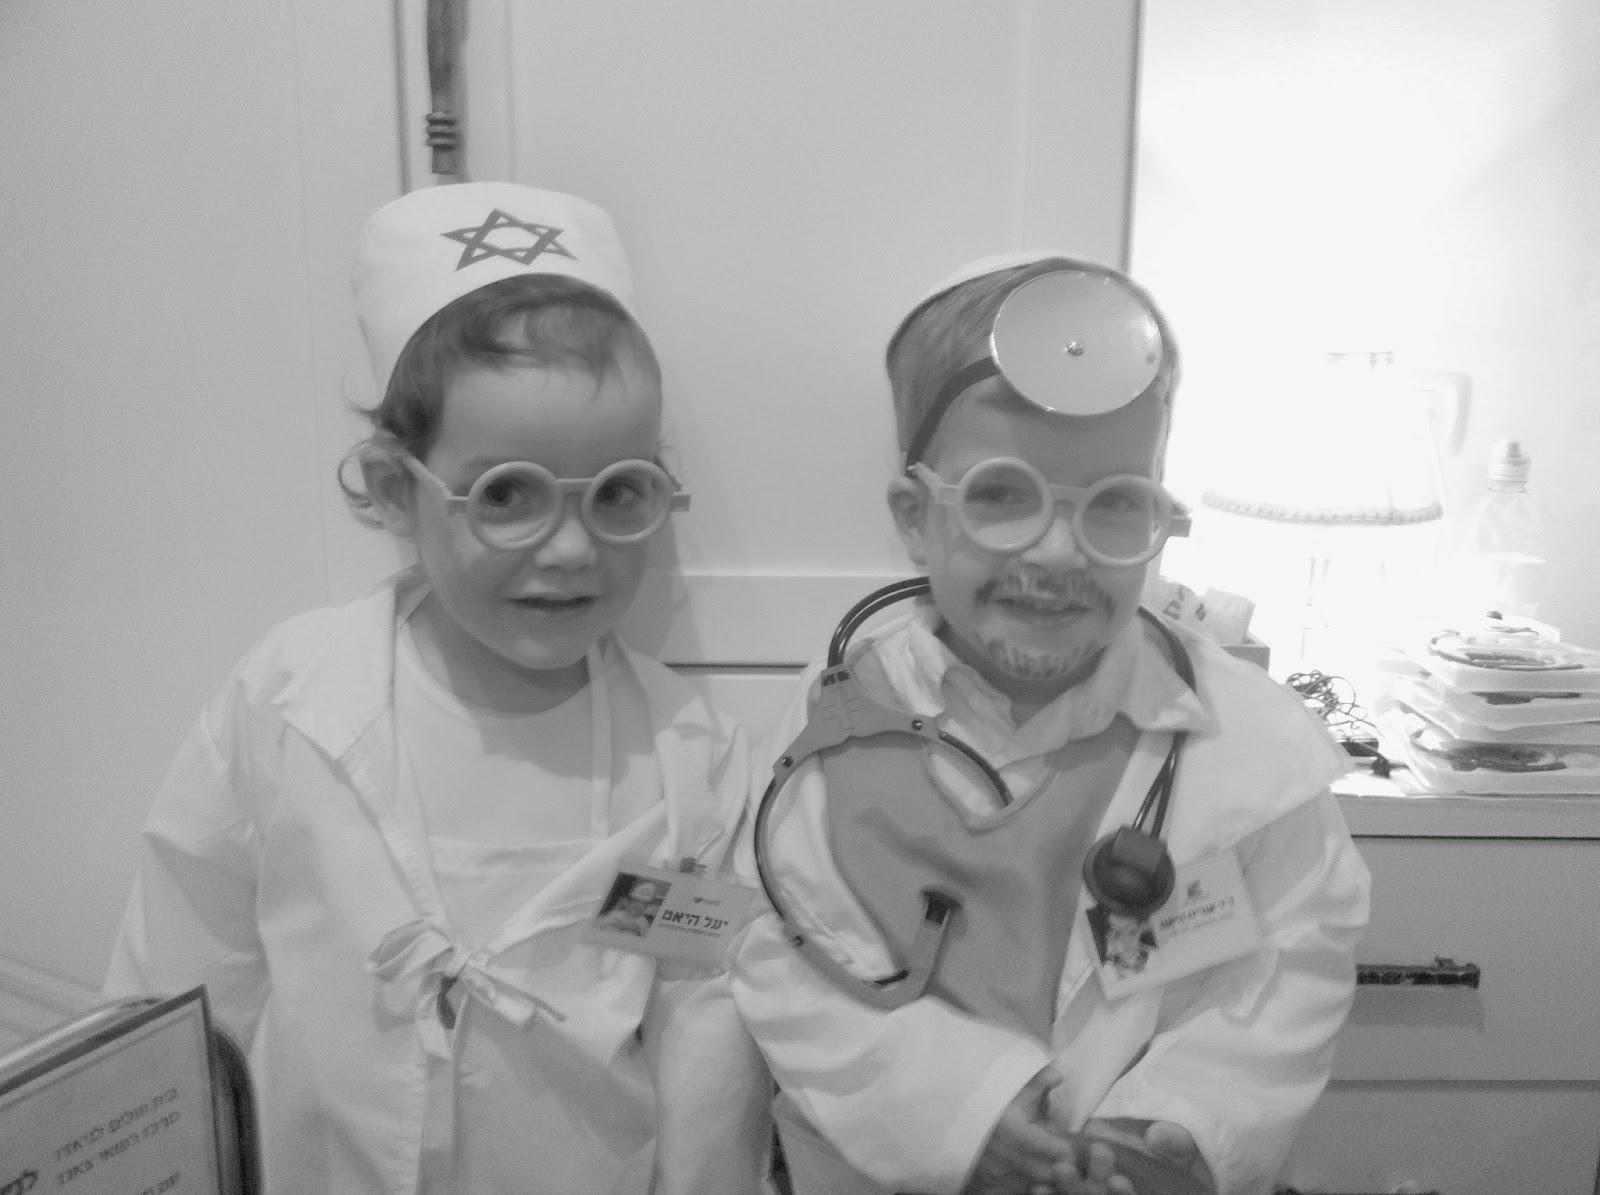 IMG 5309 - התחפשנו לרופאים!!!